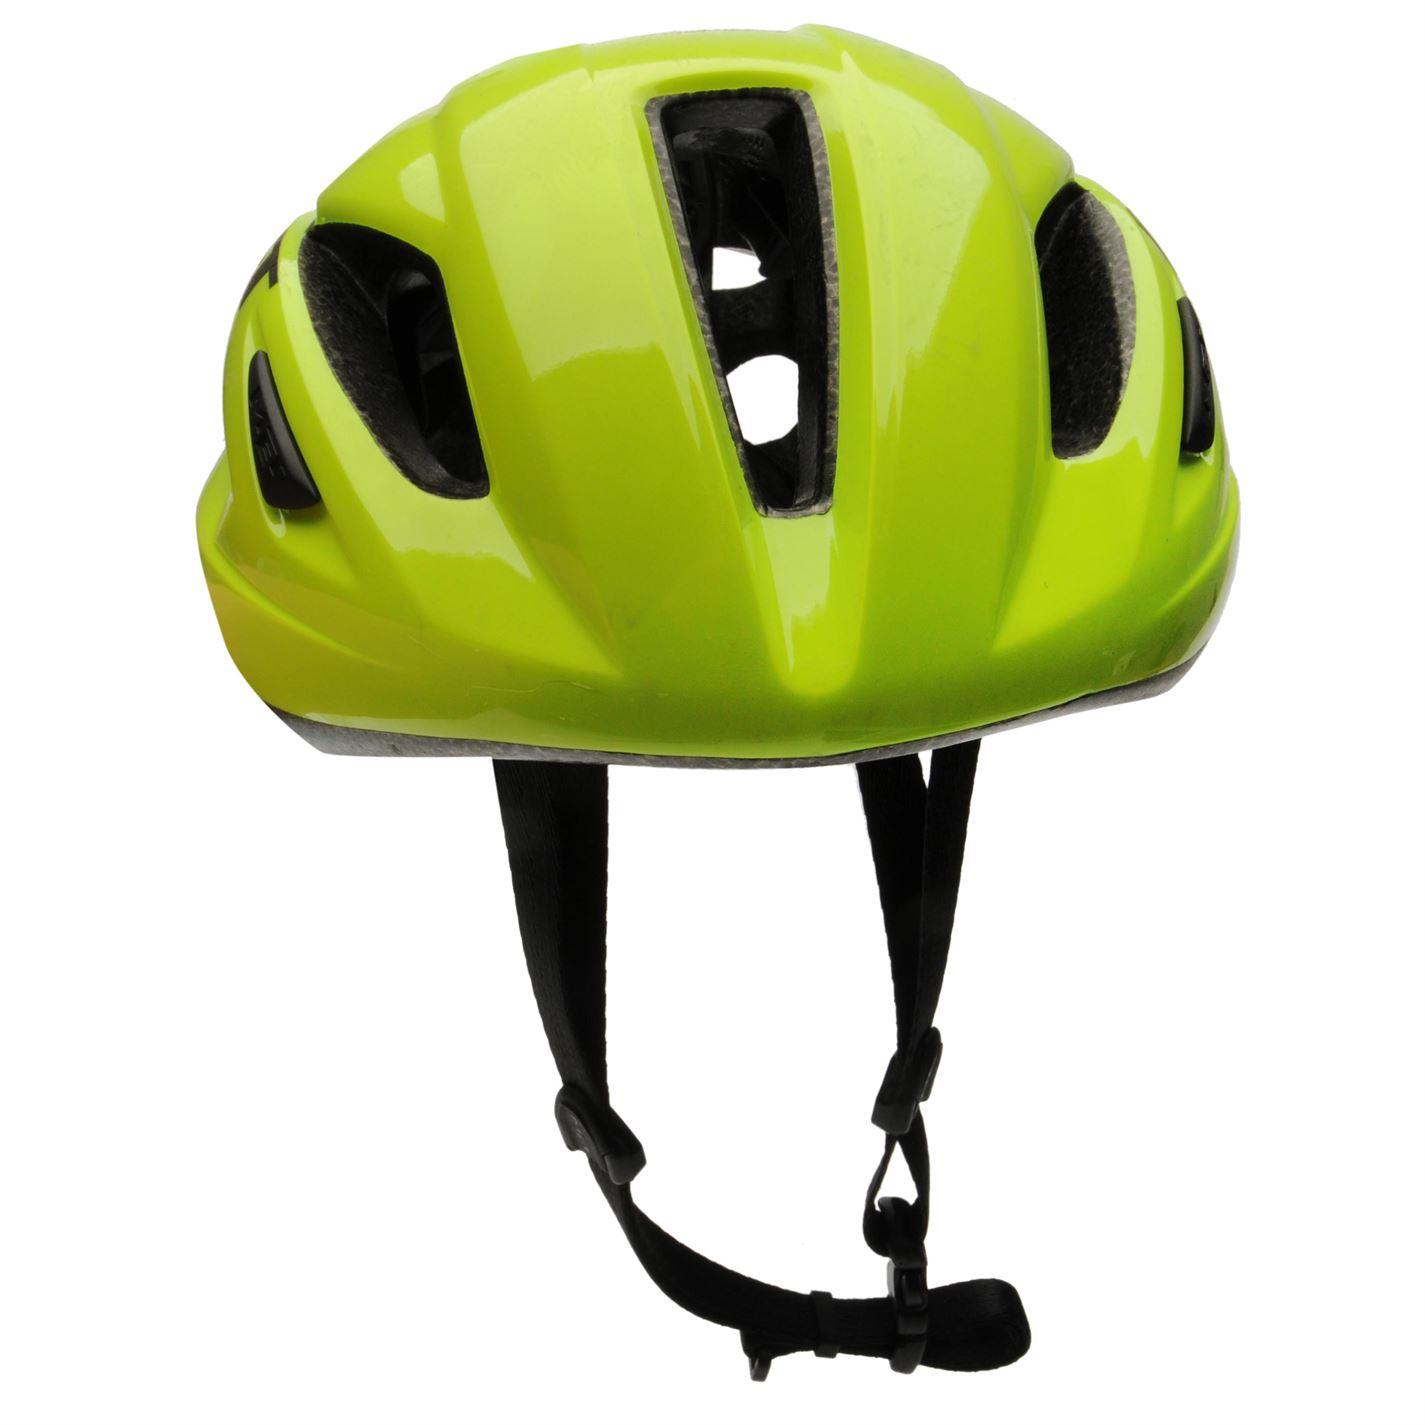 Met Strale Helmet Cycle Helmets Safety Protection